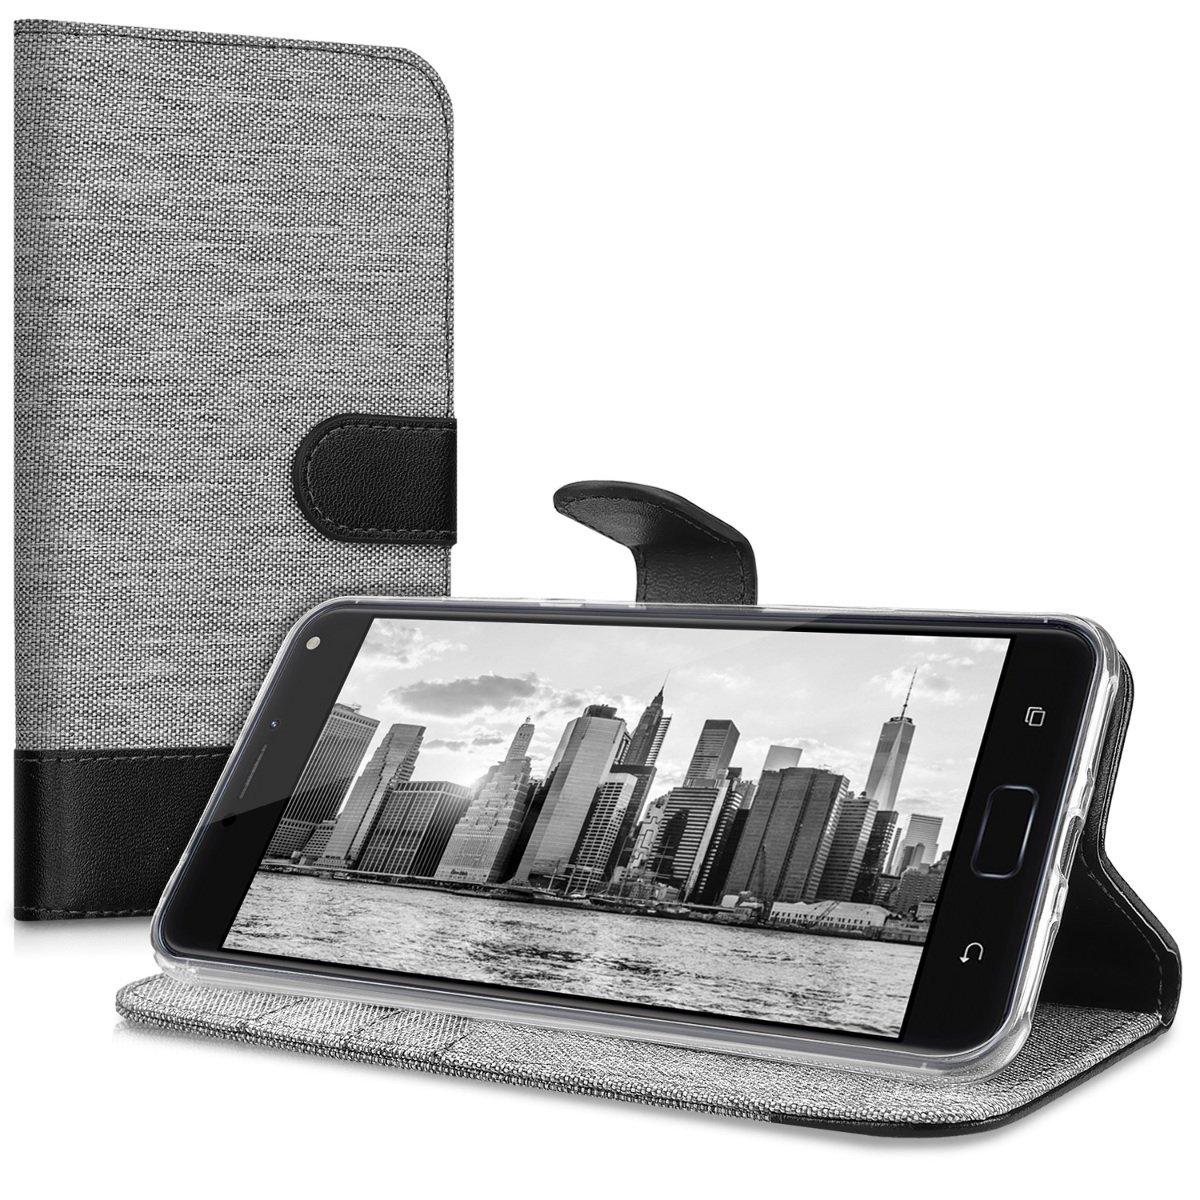 KW Θήκη Πορτοφόλι Asus Zenfone 4 Max Pro - Grey / Black Canvas (42583.01) θήκες κινητών